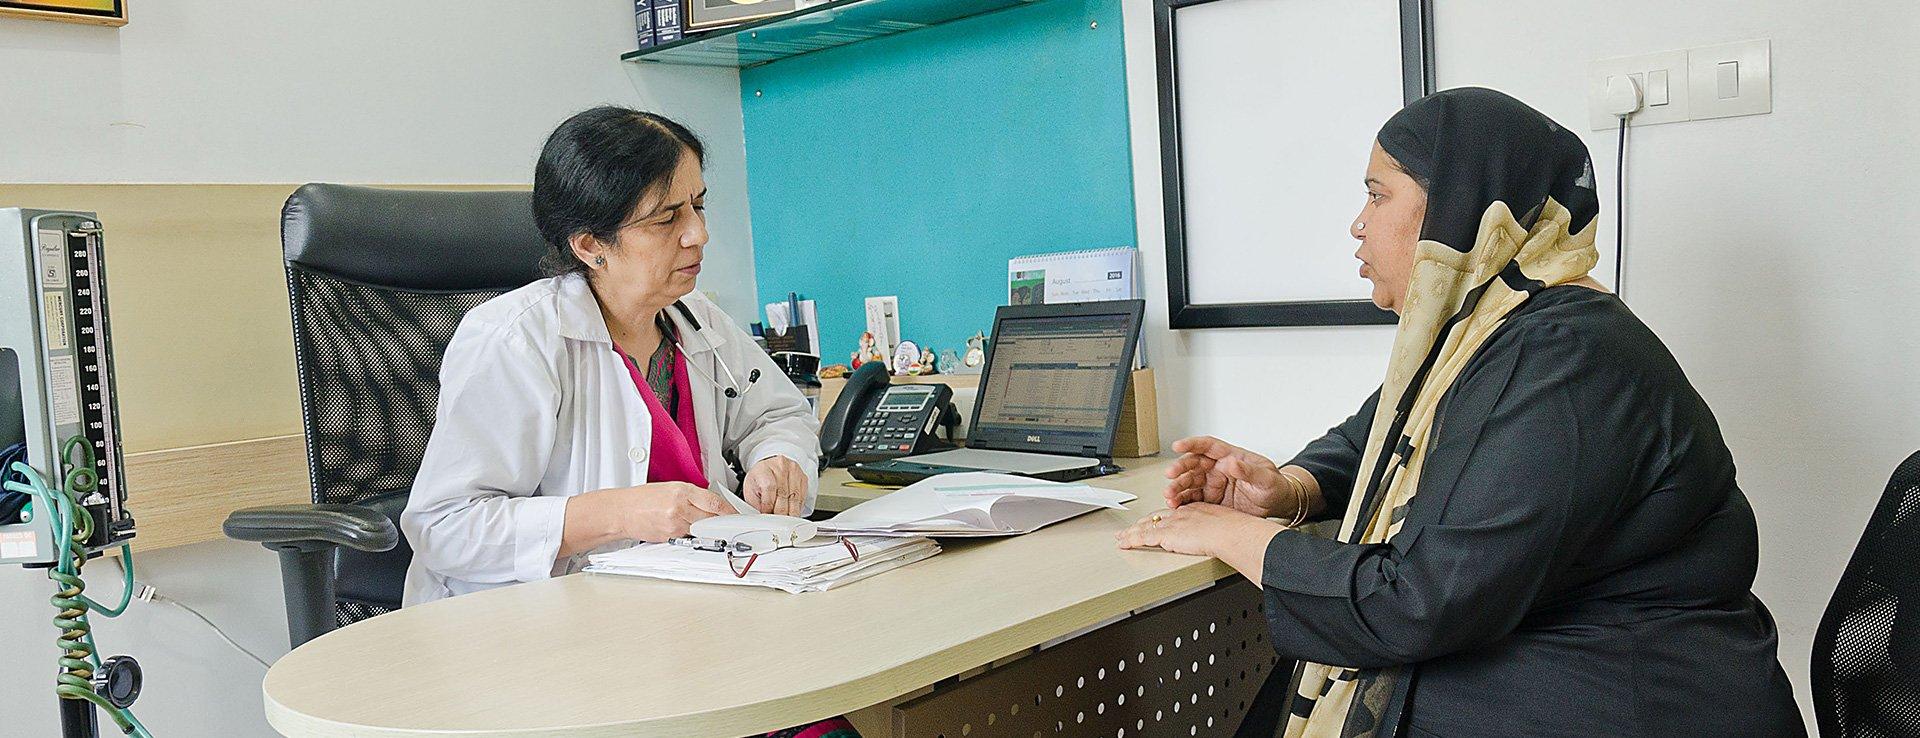 internal-medicine-hospital-mumbai